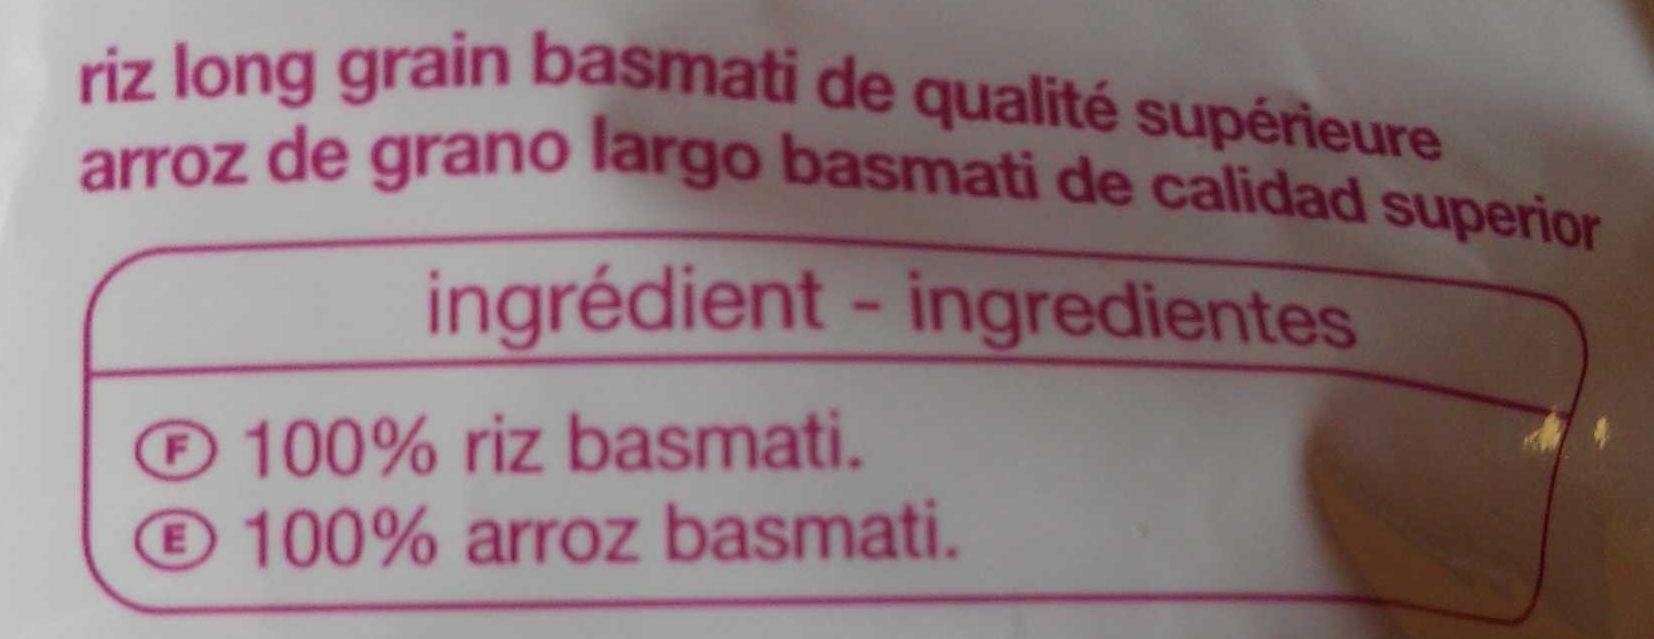 Riz basmati - Ingredientes - es